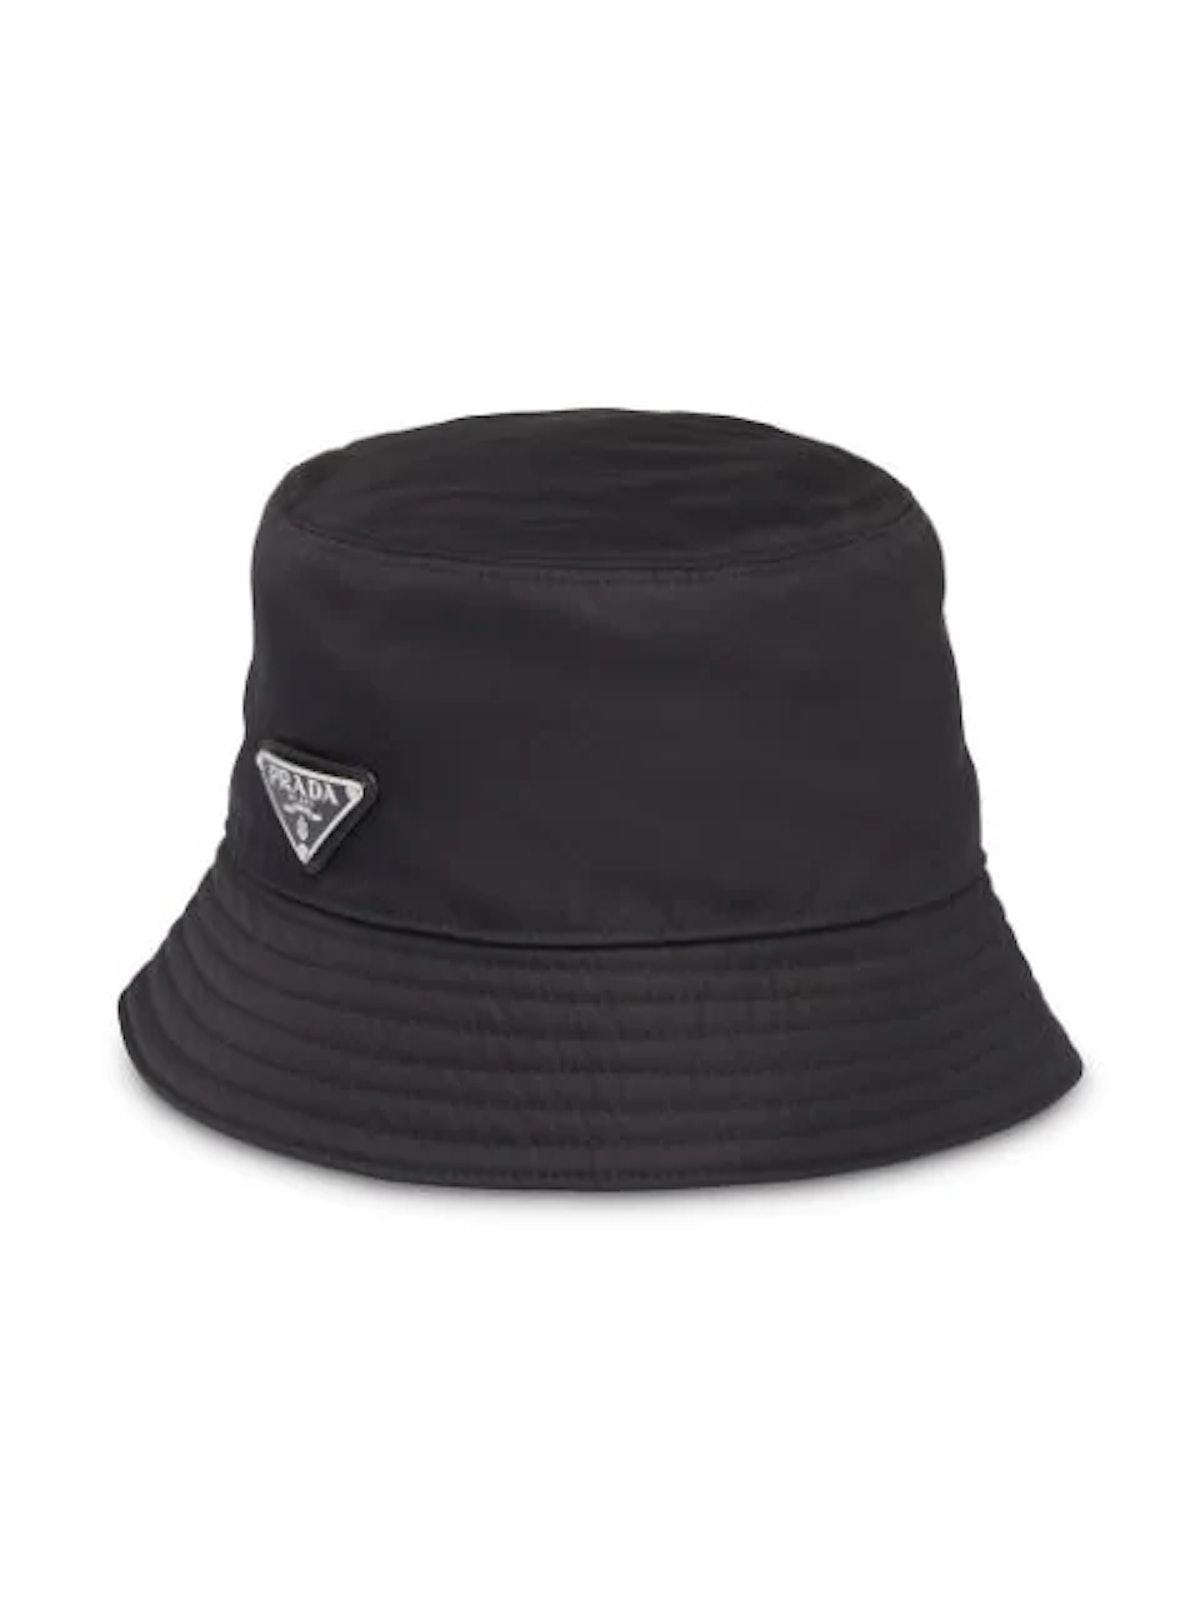 Technical Fabric Cap